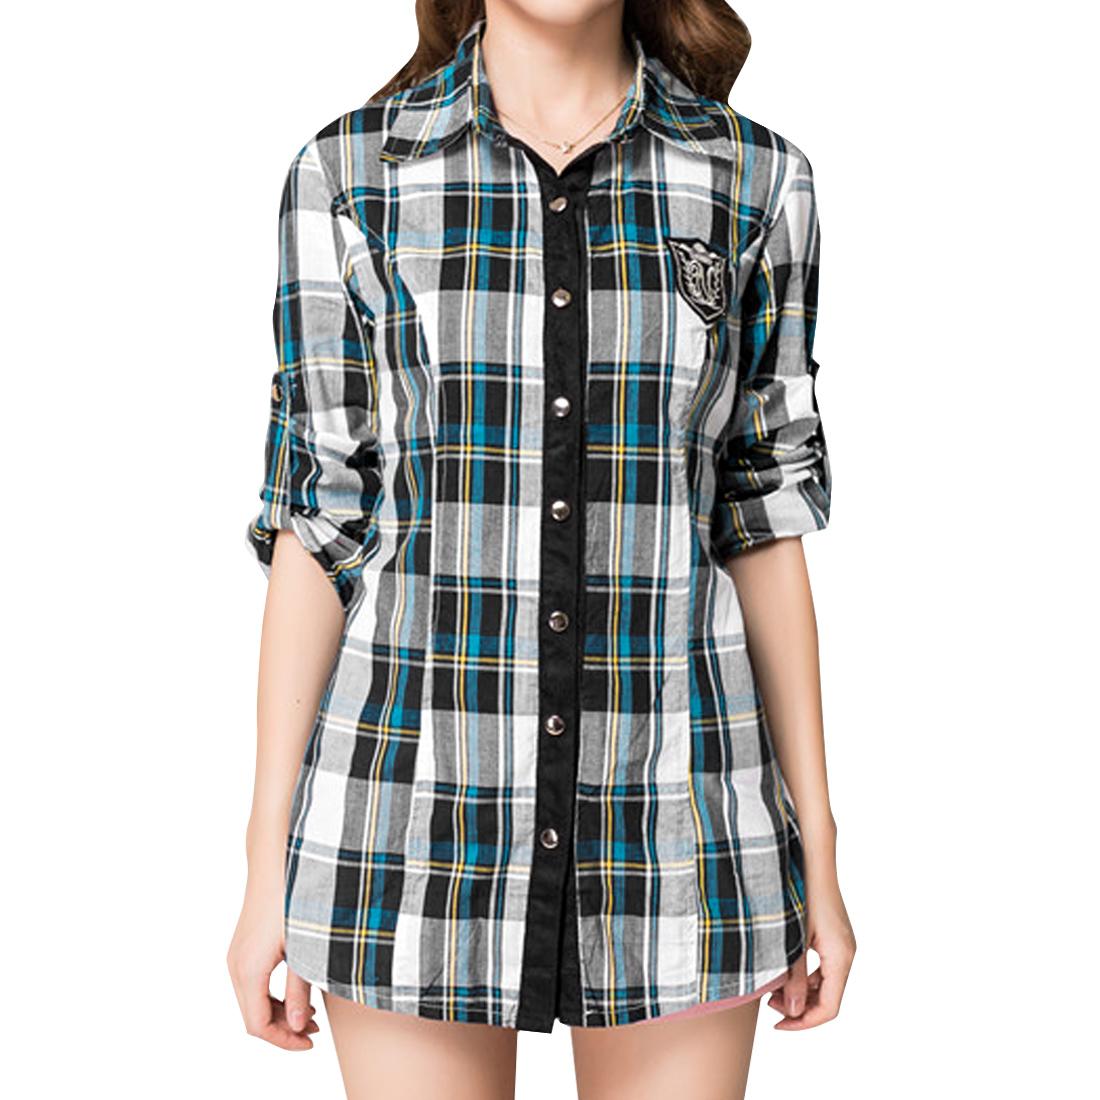 Women's Plaids Point Collar Long Sleeved Round Hem Buttoned Front Blue S Shirt